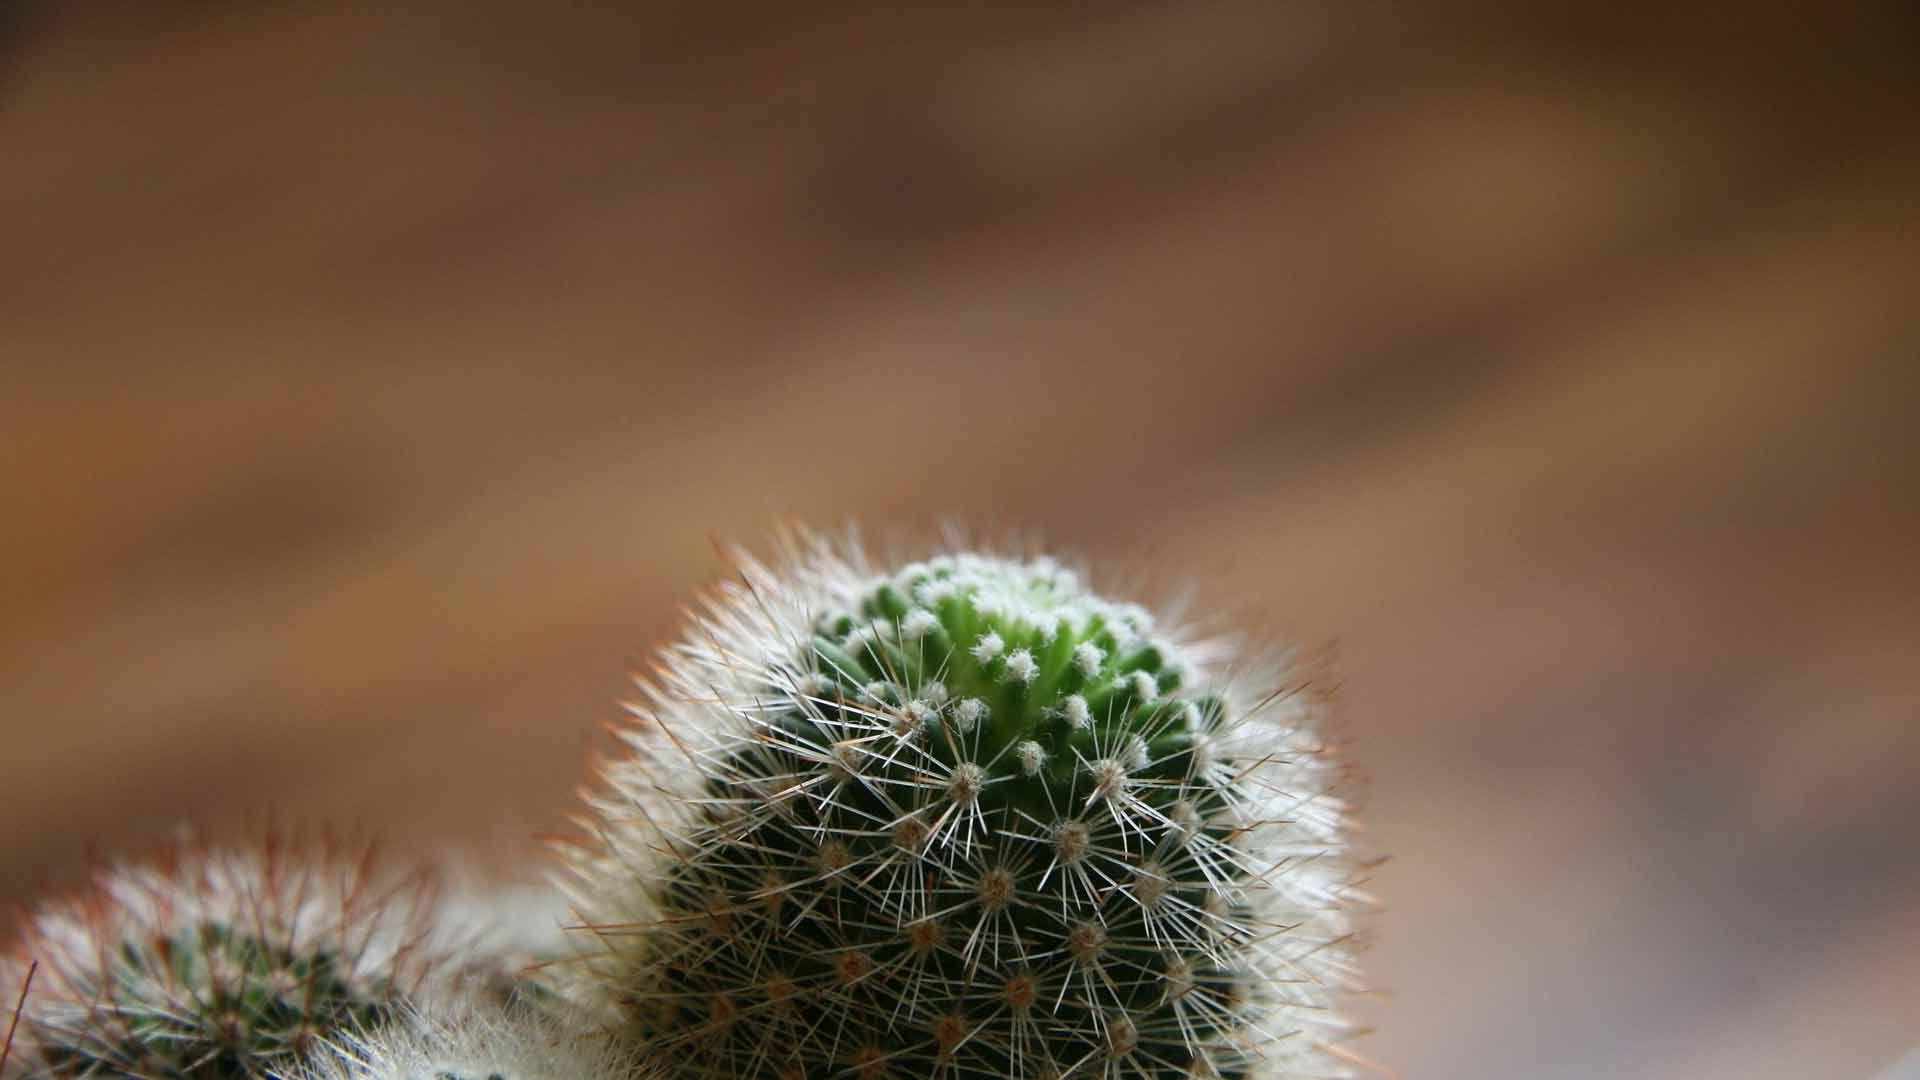 Cactus wallpaper picture hd